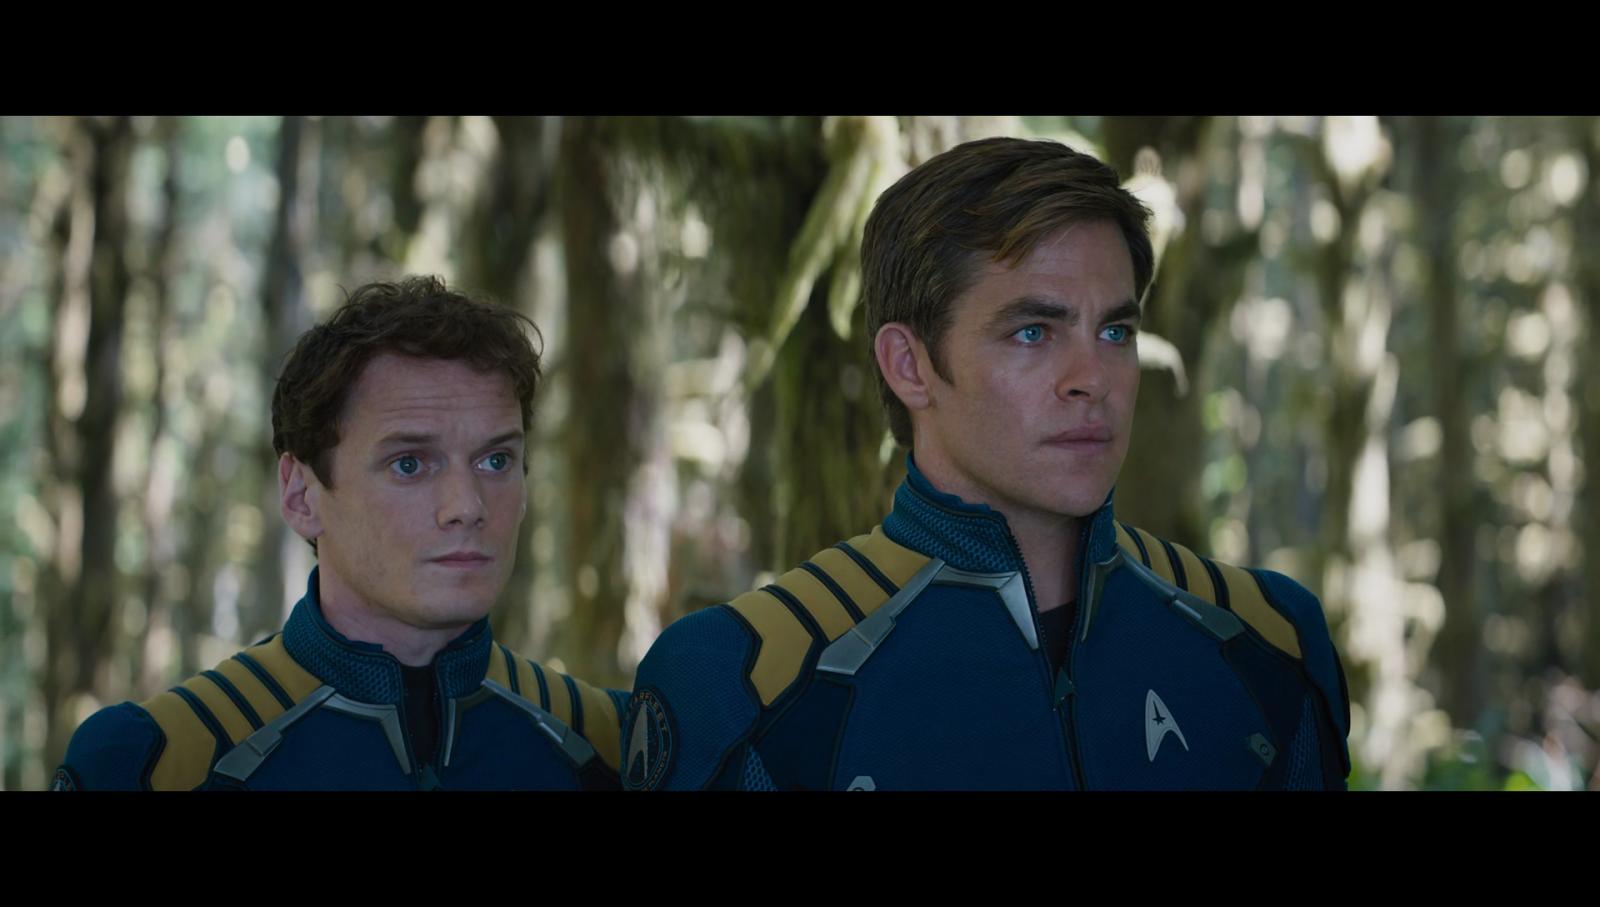 Captura de Star Trek Sin Límites (2016) 1080p BluRay x265 HEVC DTS Dual Latino